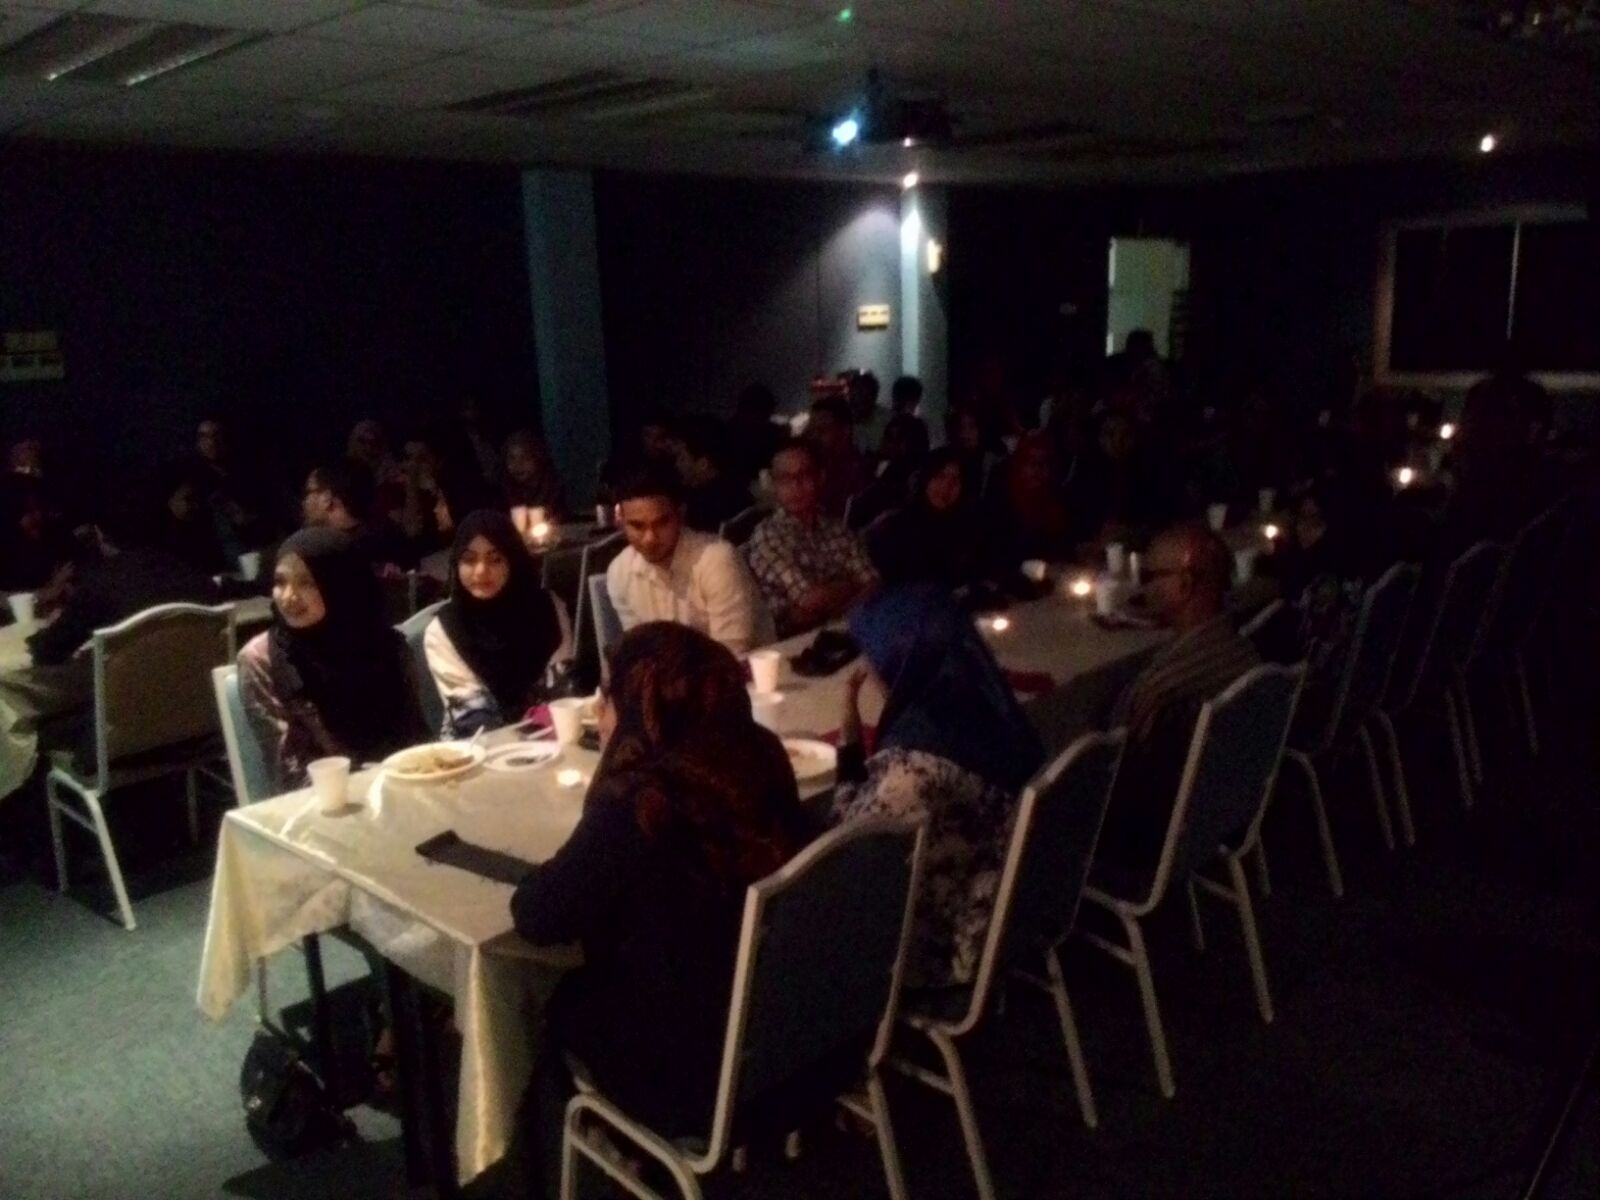 dans le noir dining in the dark 2